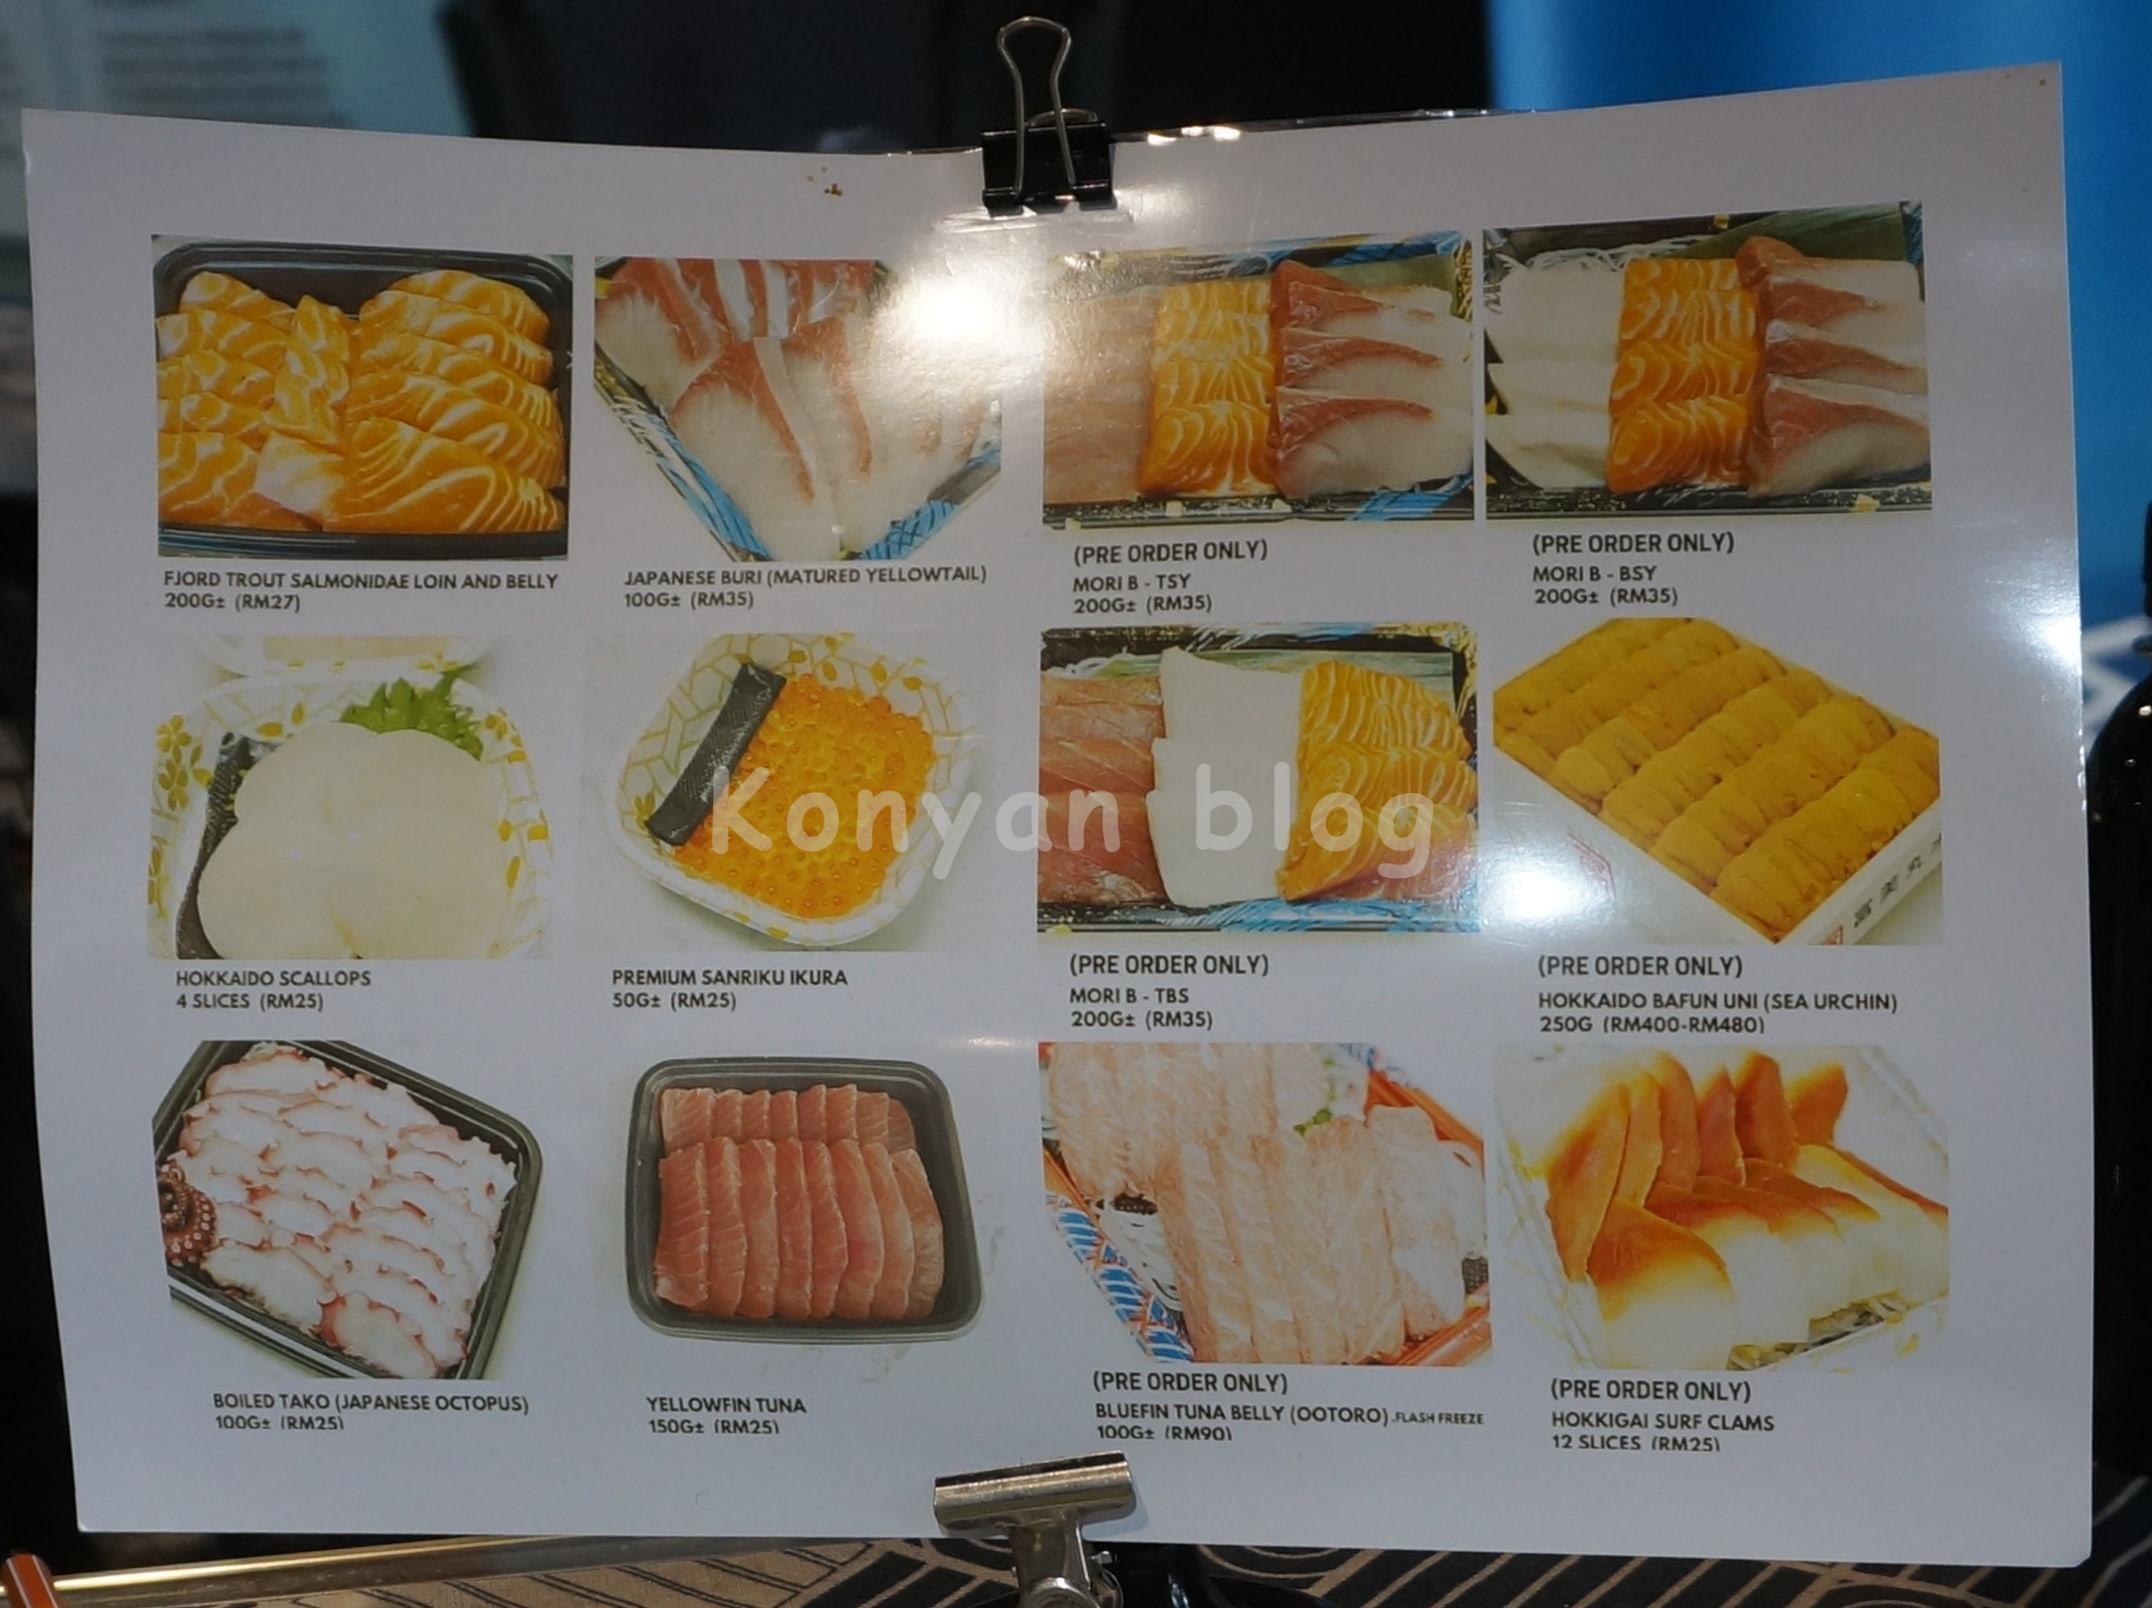 Top Catch Fisheries 一頂魚屋 刺身 Taman Megah menu